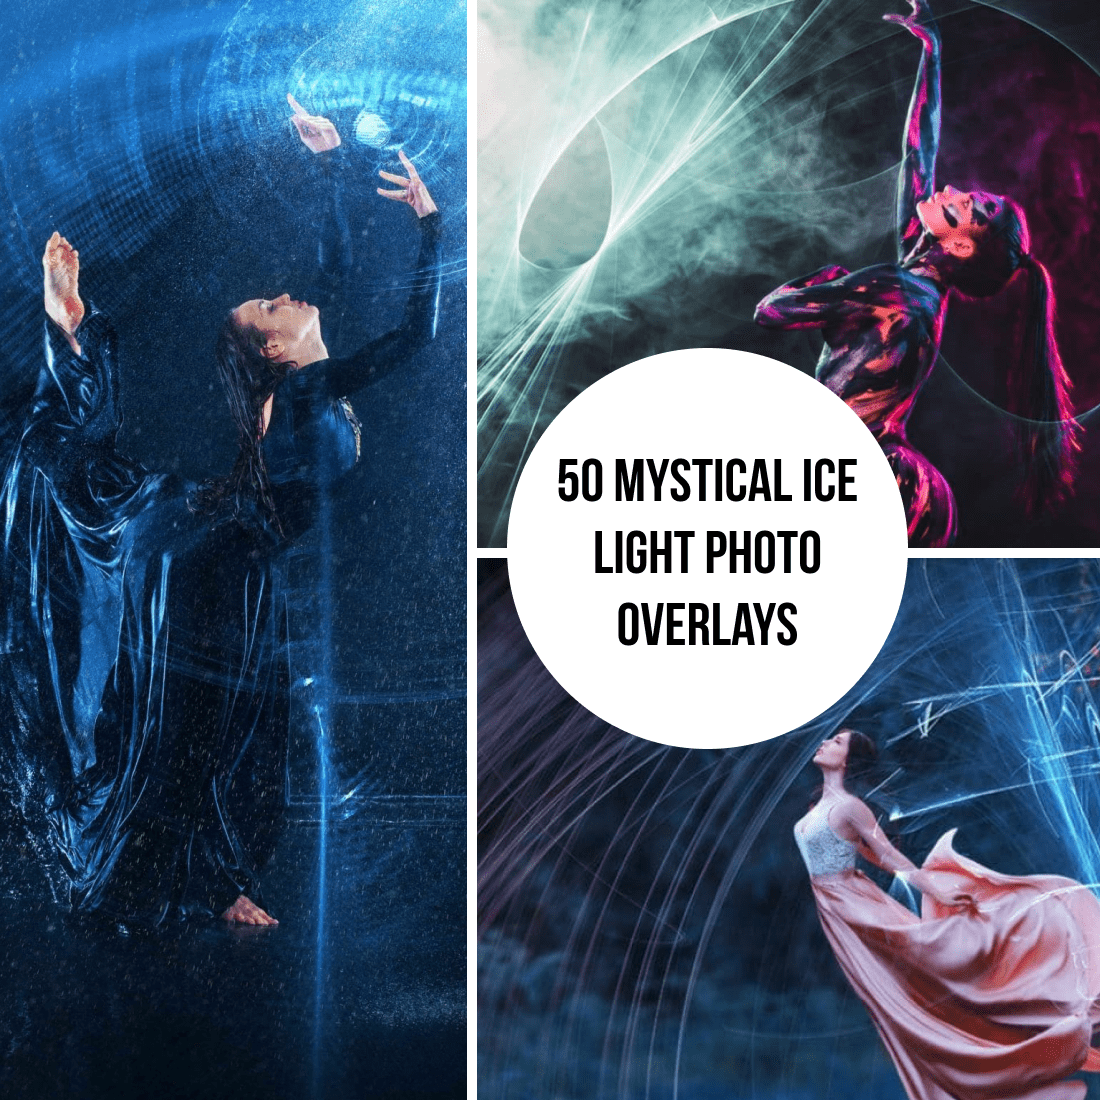 Mystical Ice Light Photo Overlays